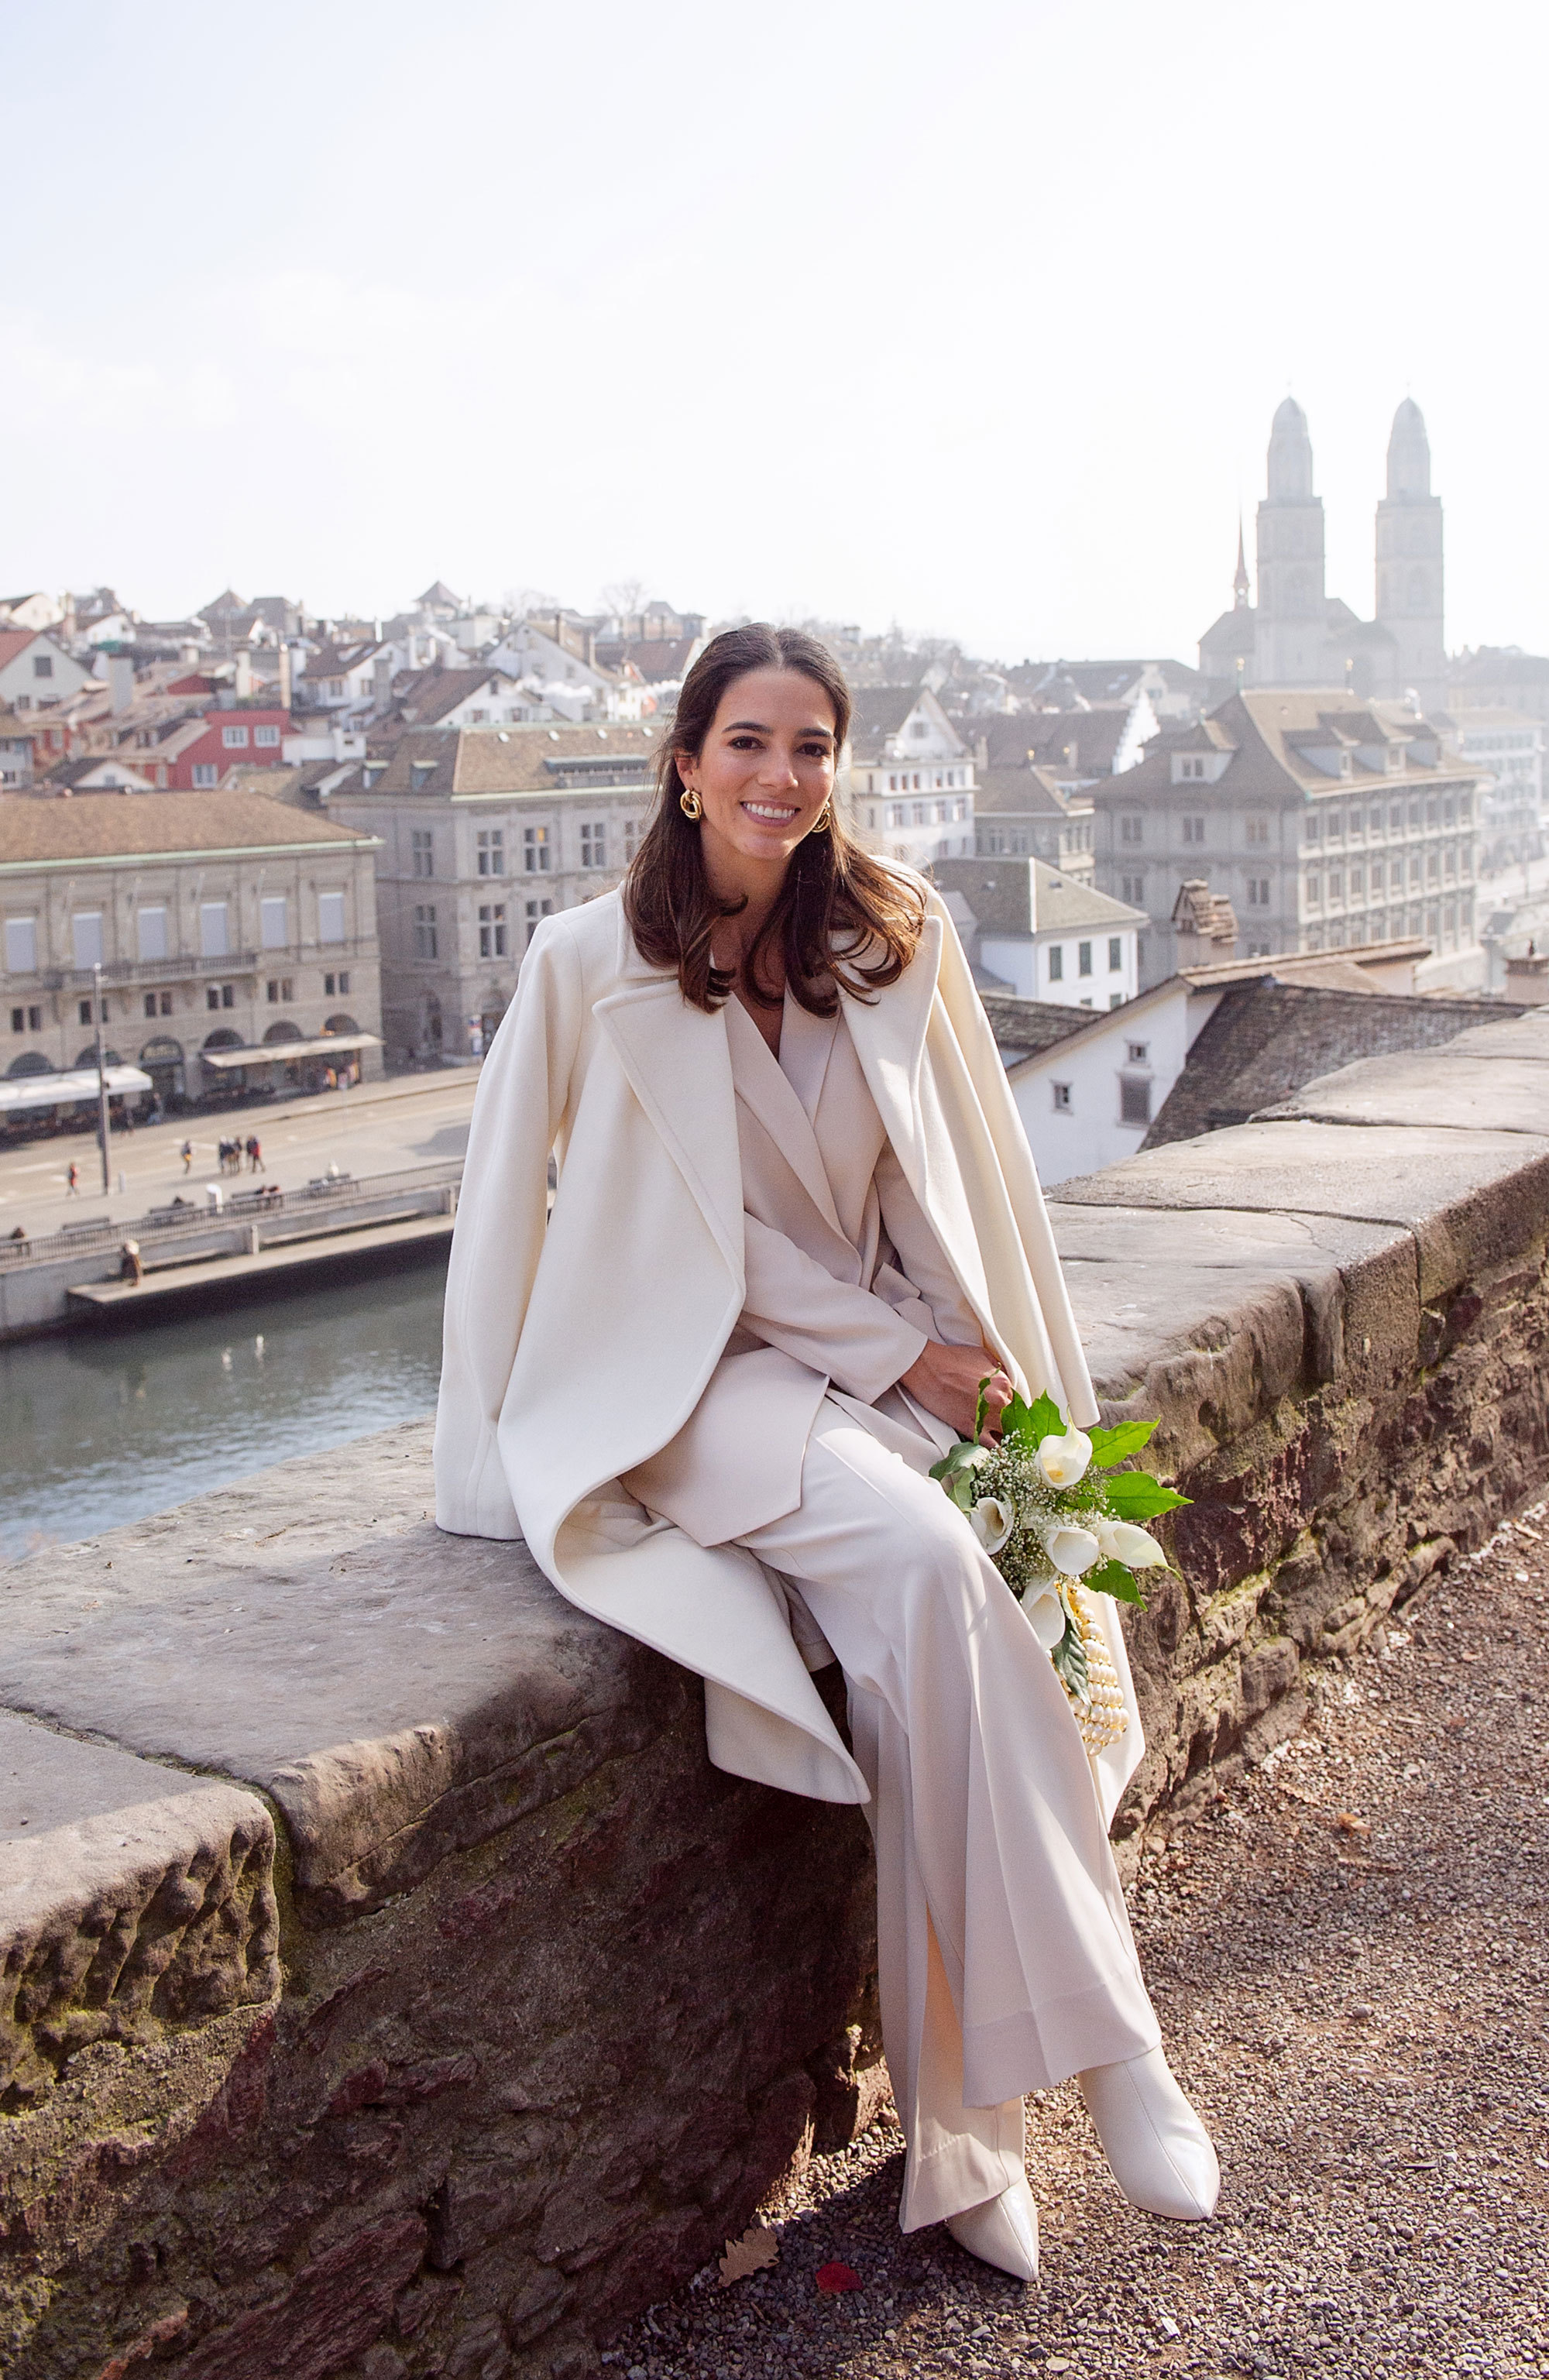 juliana-cosimo-stadthaus-wedding-28.jpg